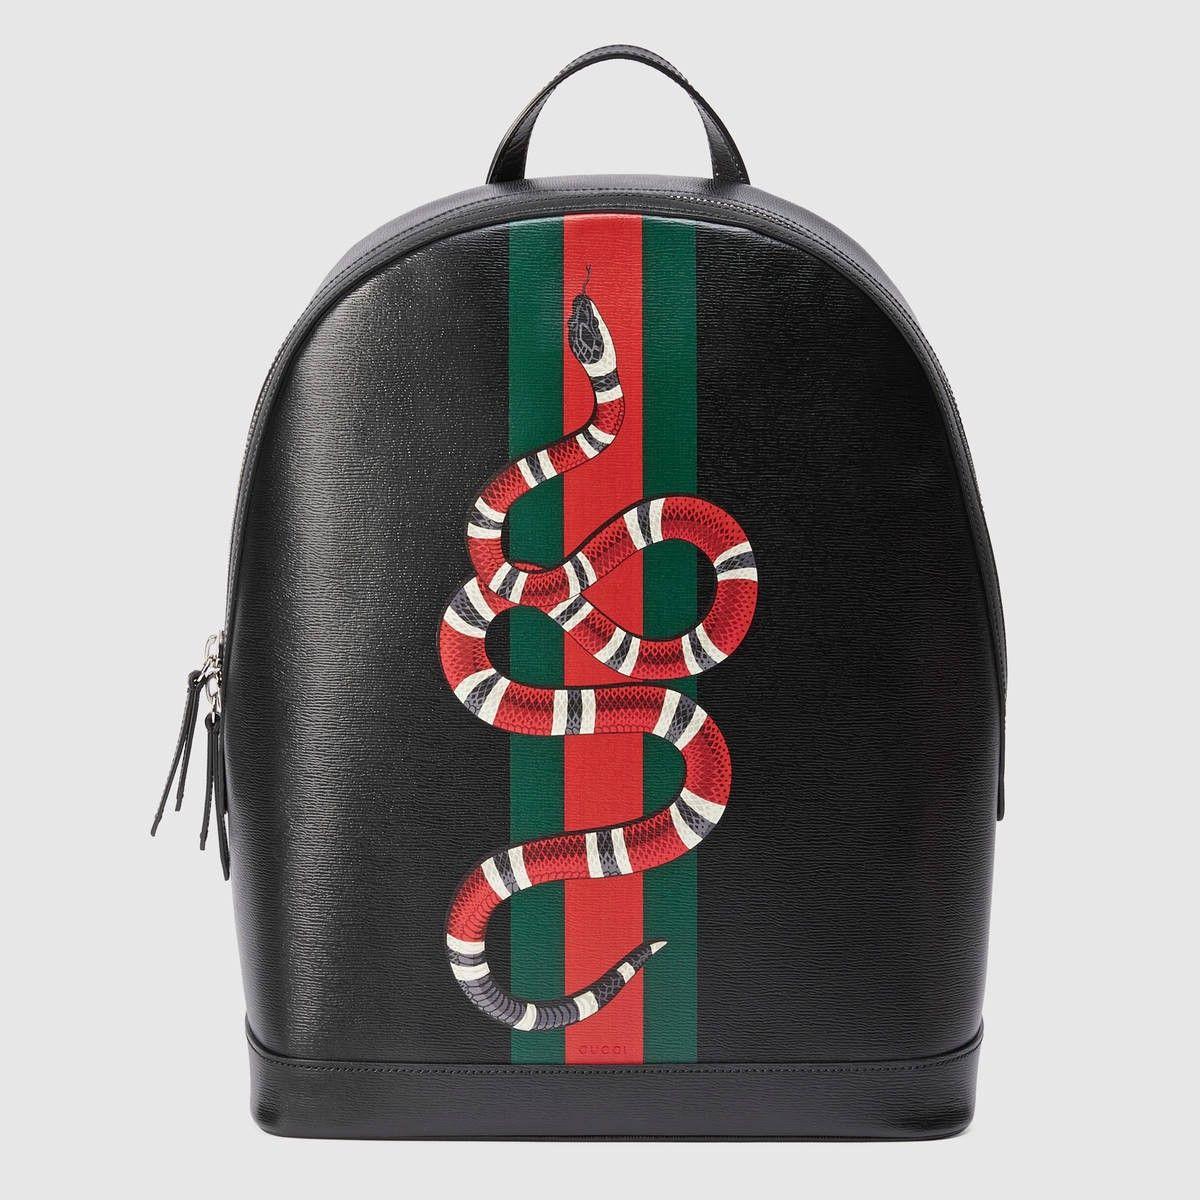 7ea80badb GUCCI Web and Kingsnake print leather backpack - black leather. #gucci #bags  #lining #nylon #backpacks #suede #